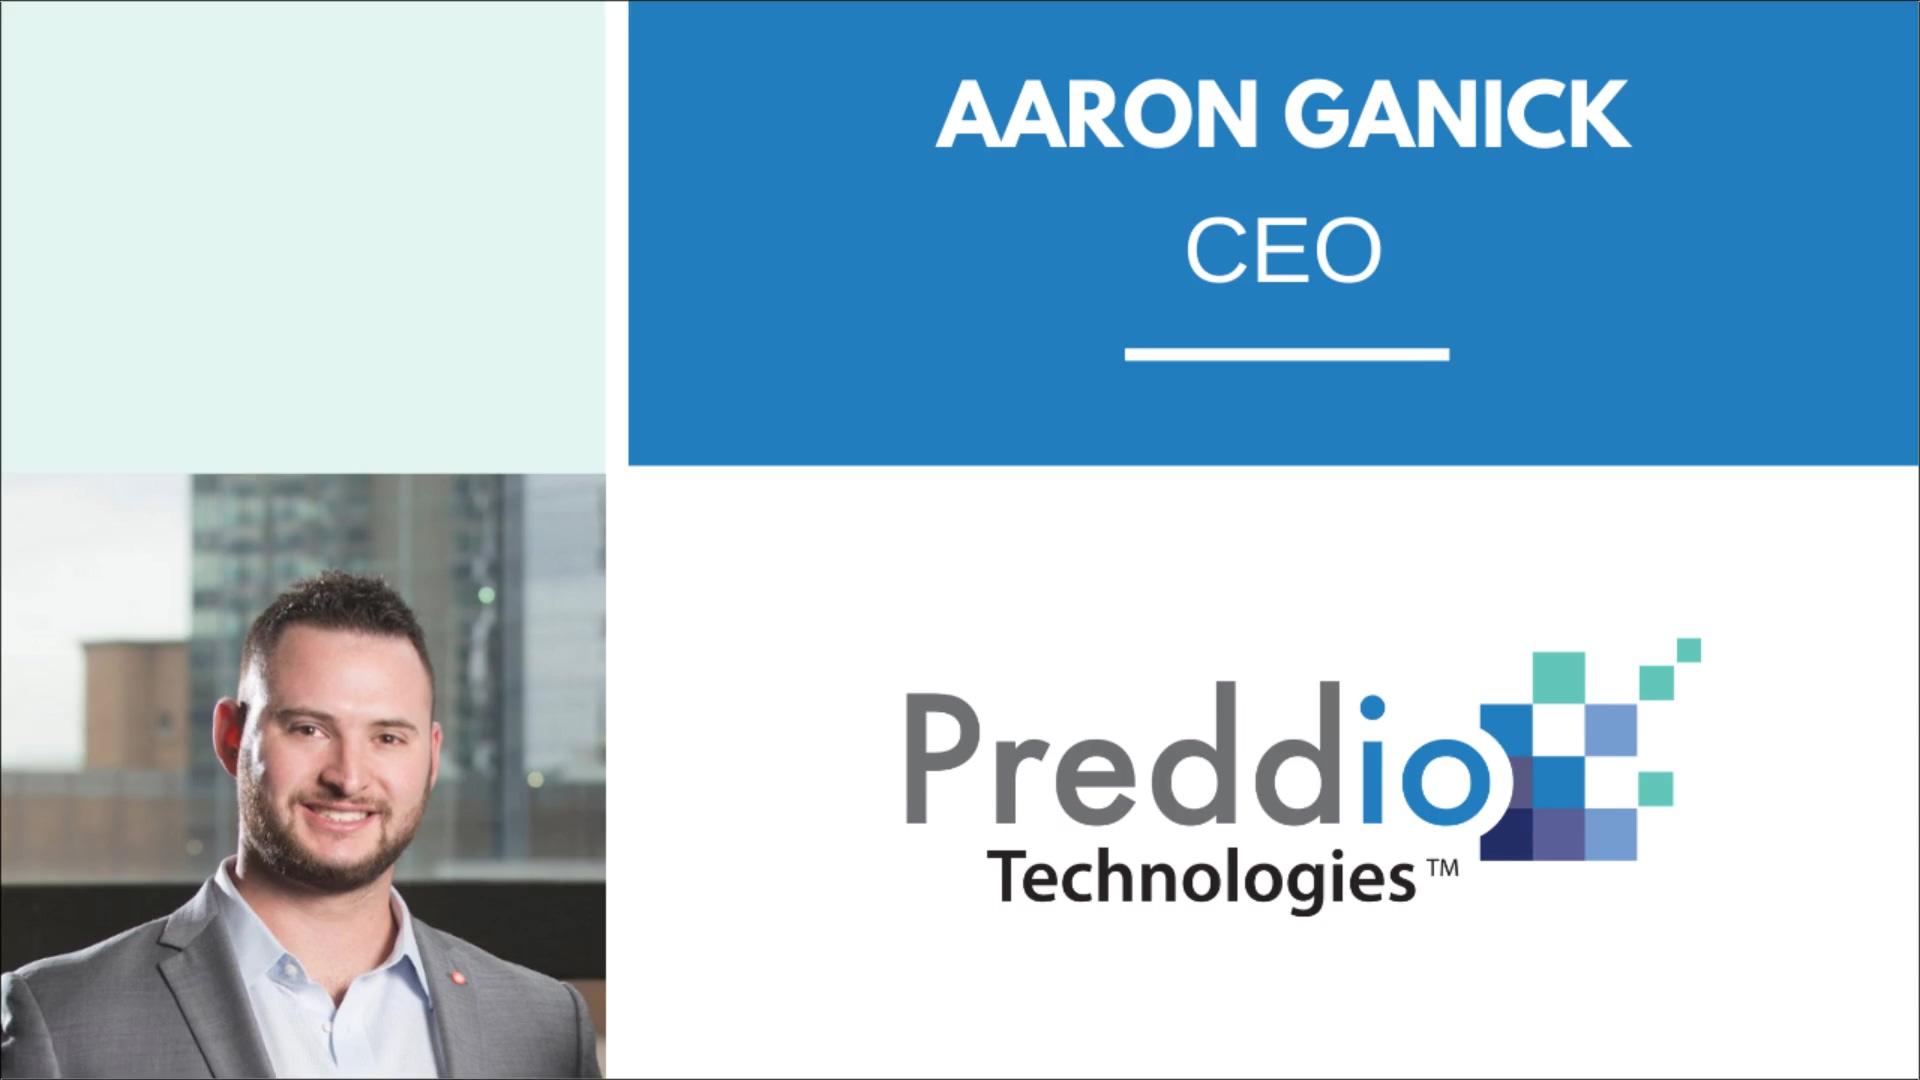 Aaron Ganick Draft 2 (3)